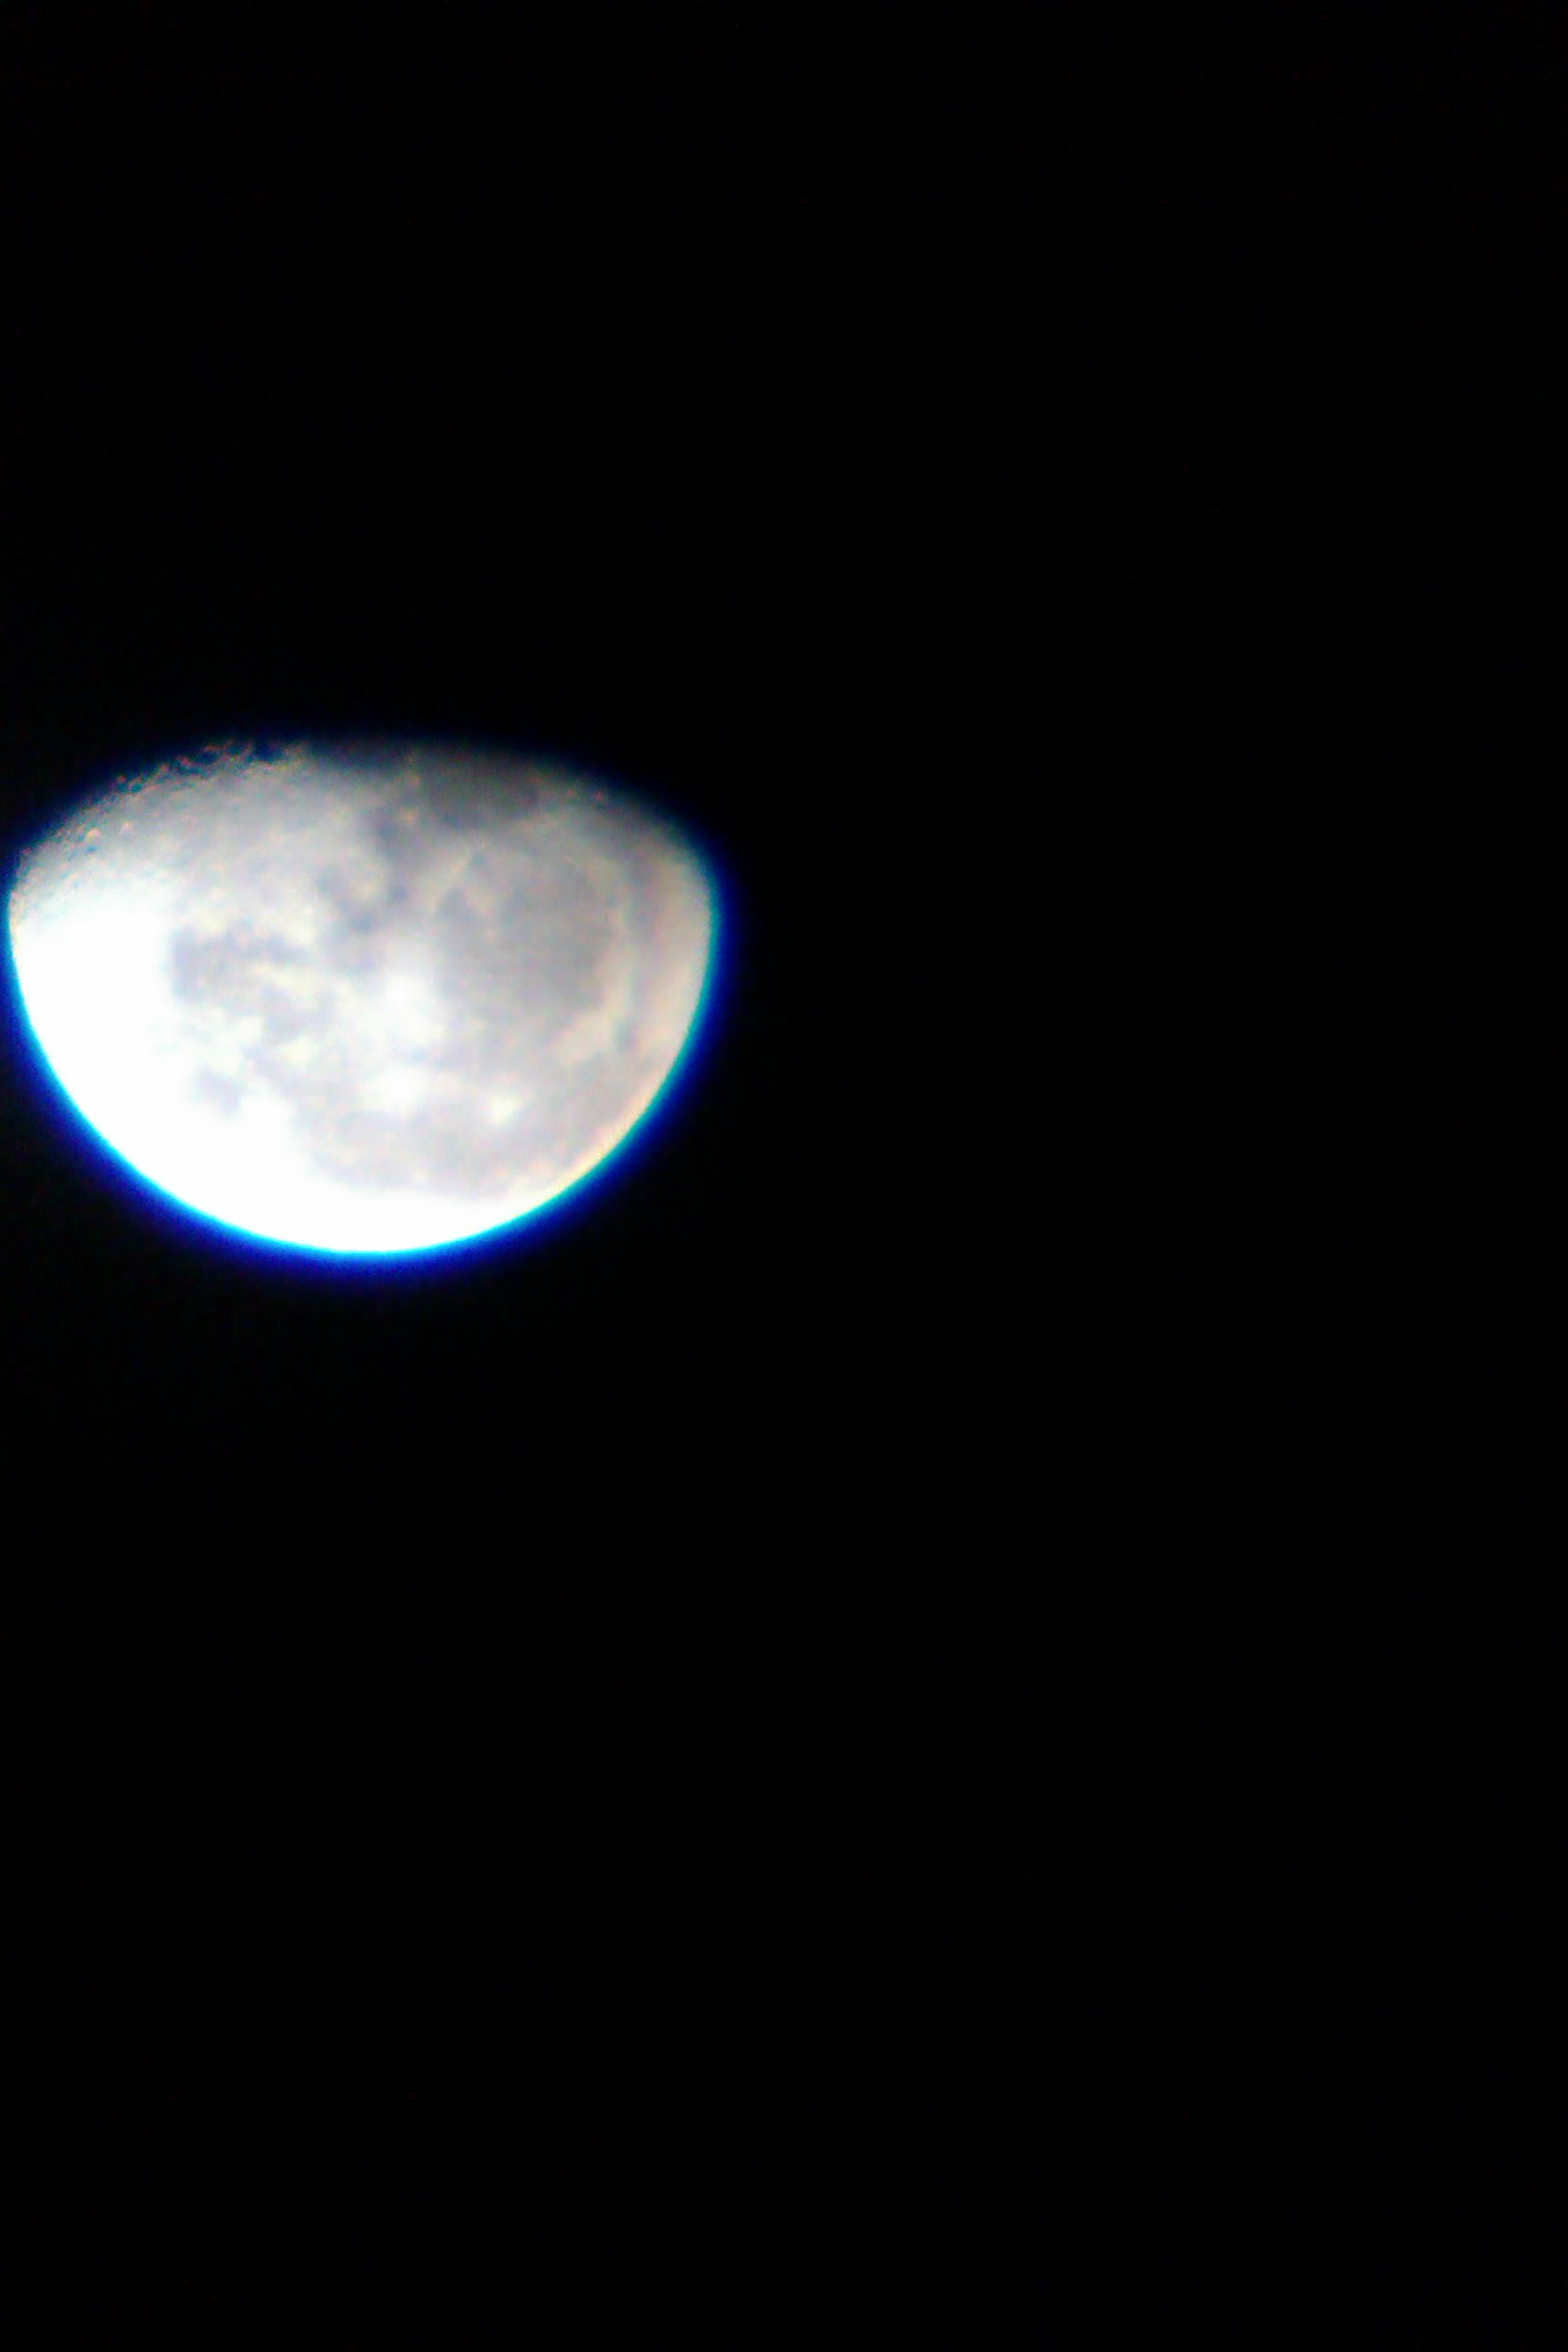 myblog.9e.cz/teleskop/M11.jpg